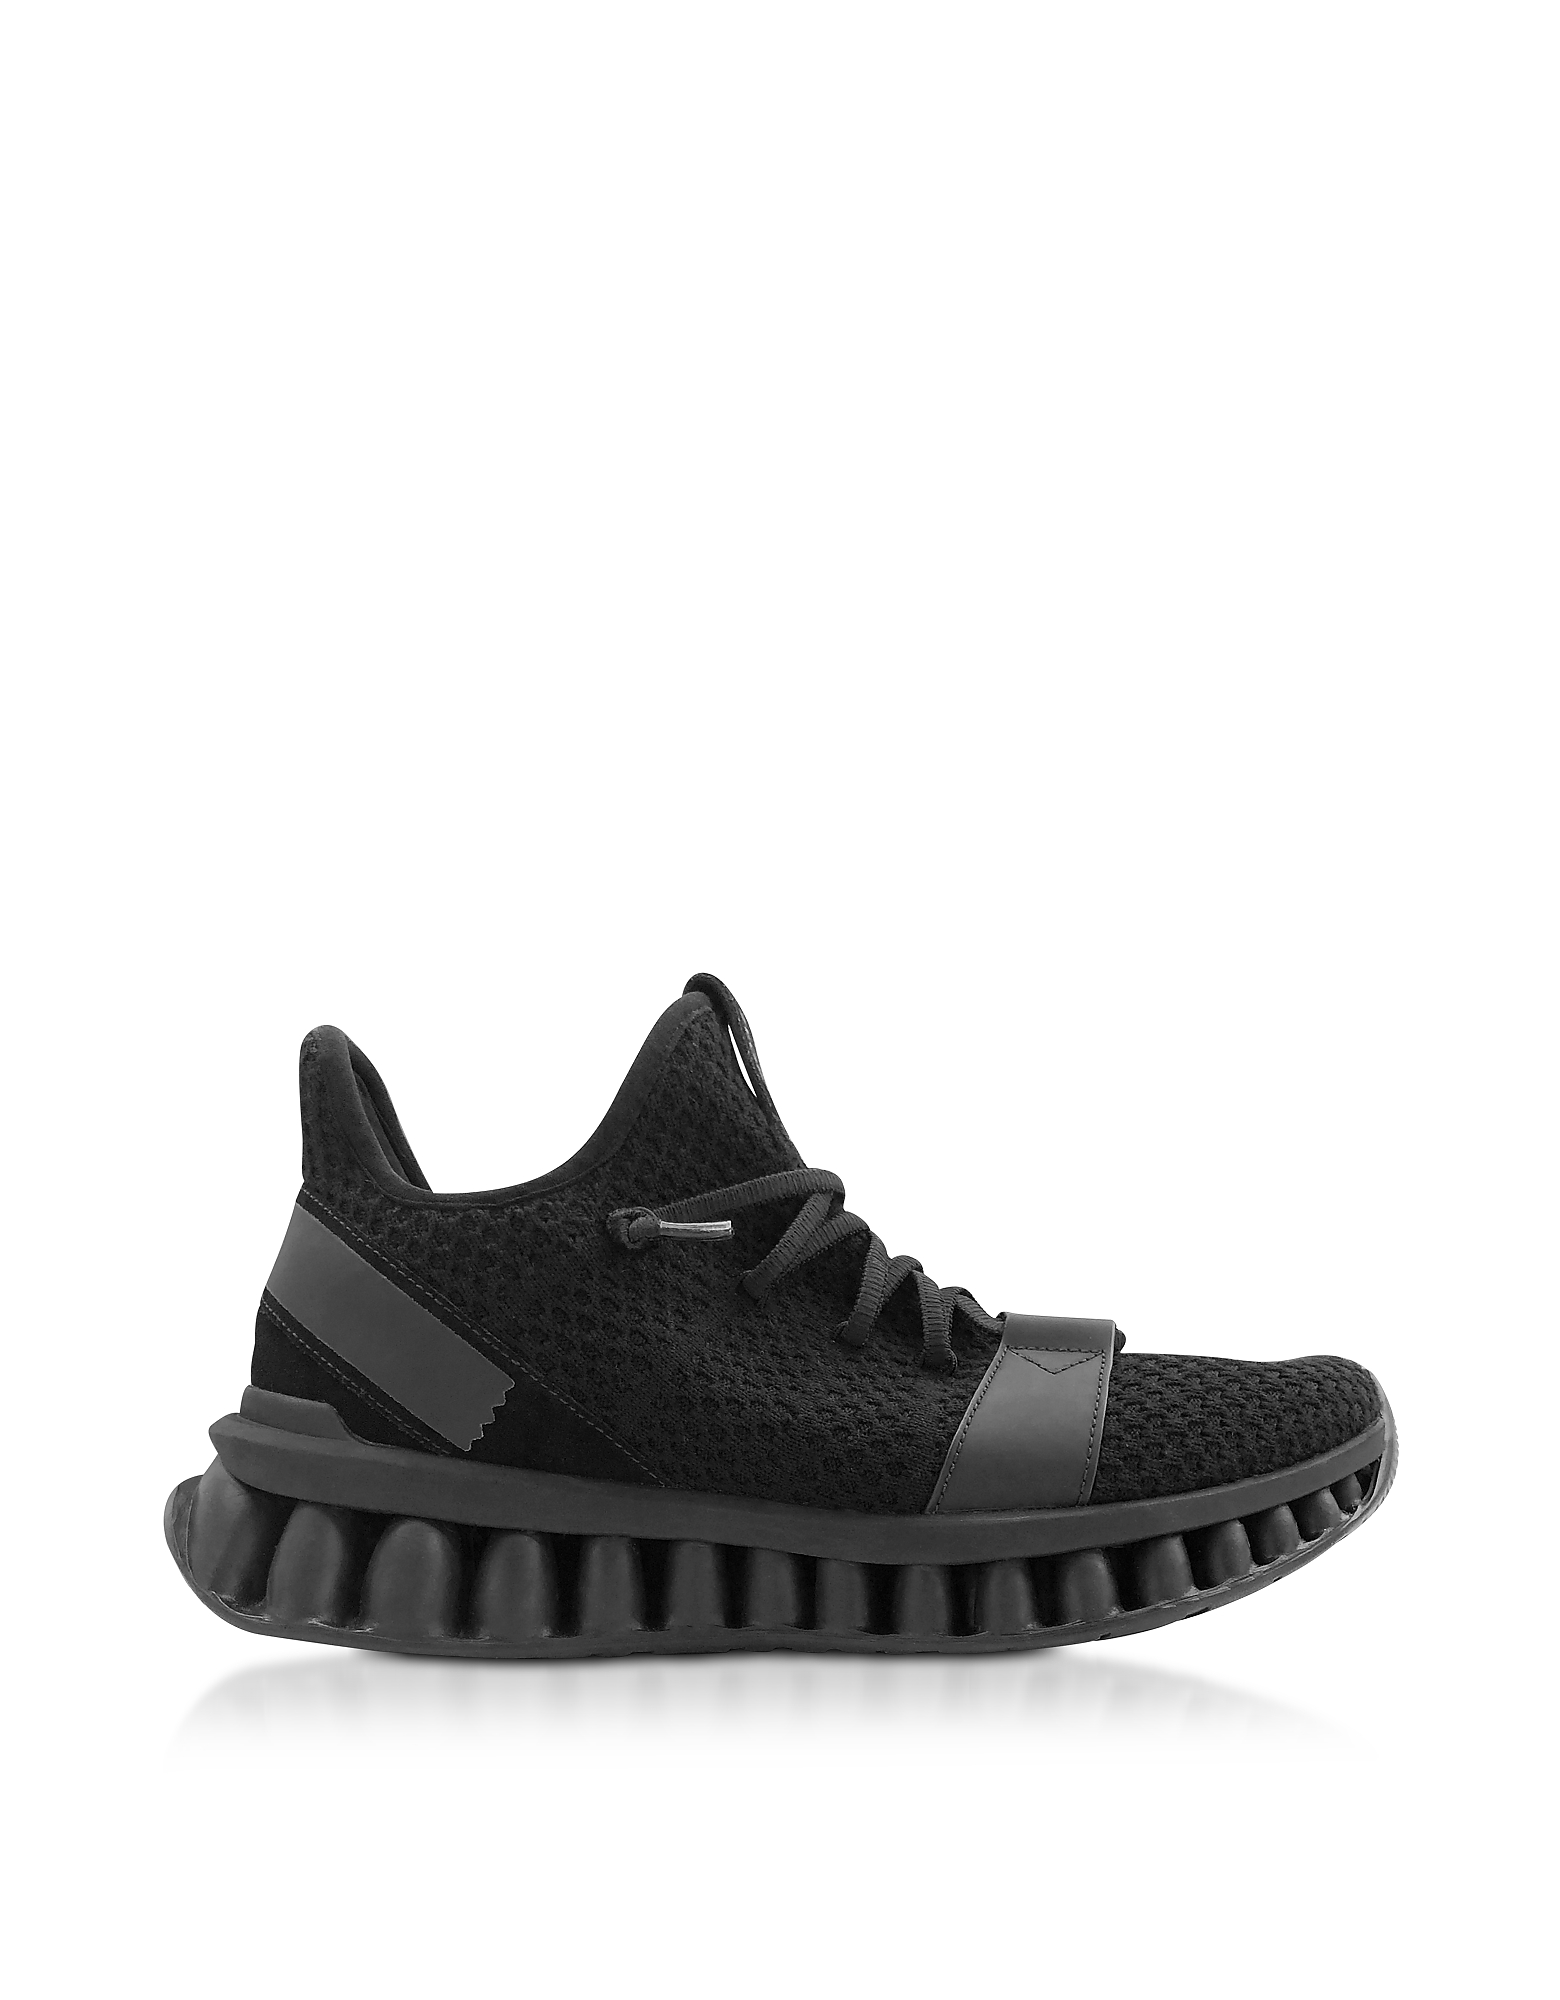 Ermenegildo Zegna Designer Shoes, Black TECHMERINO A-Maze sneakers